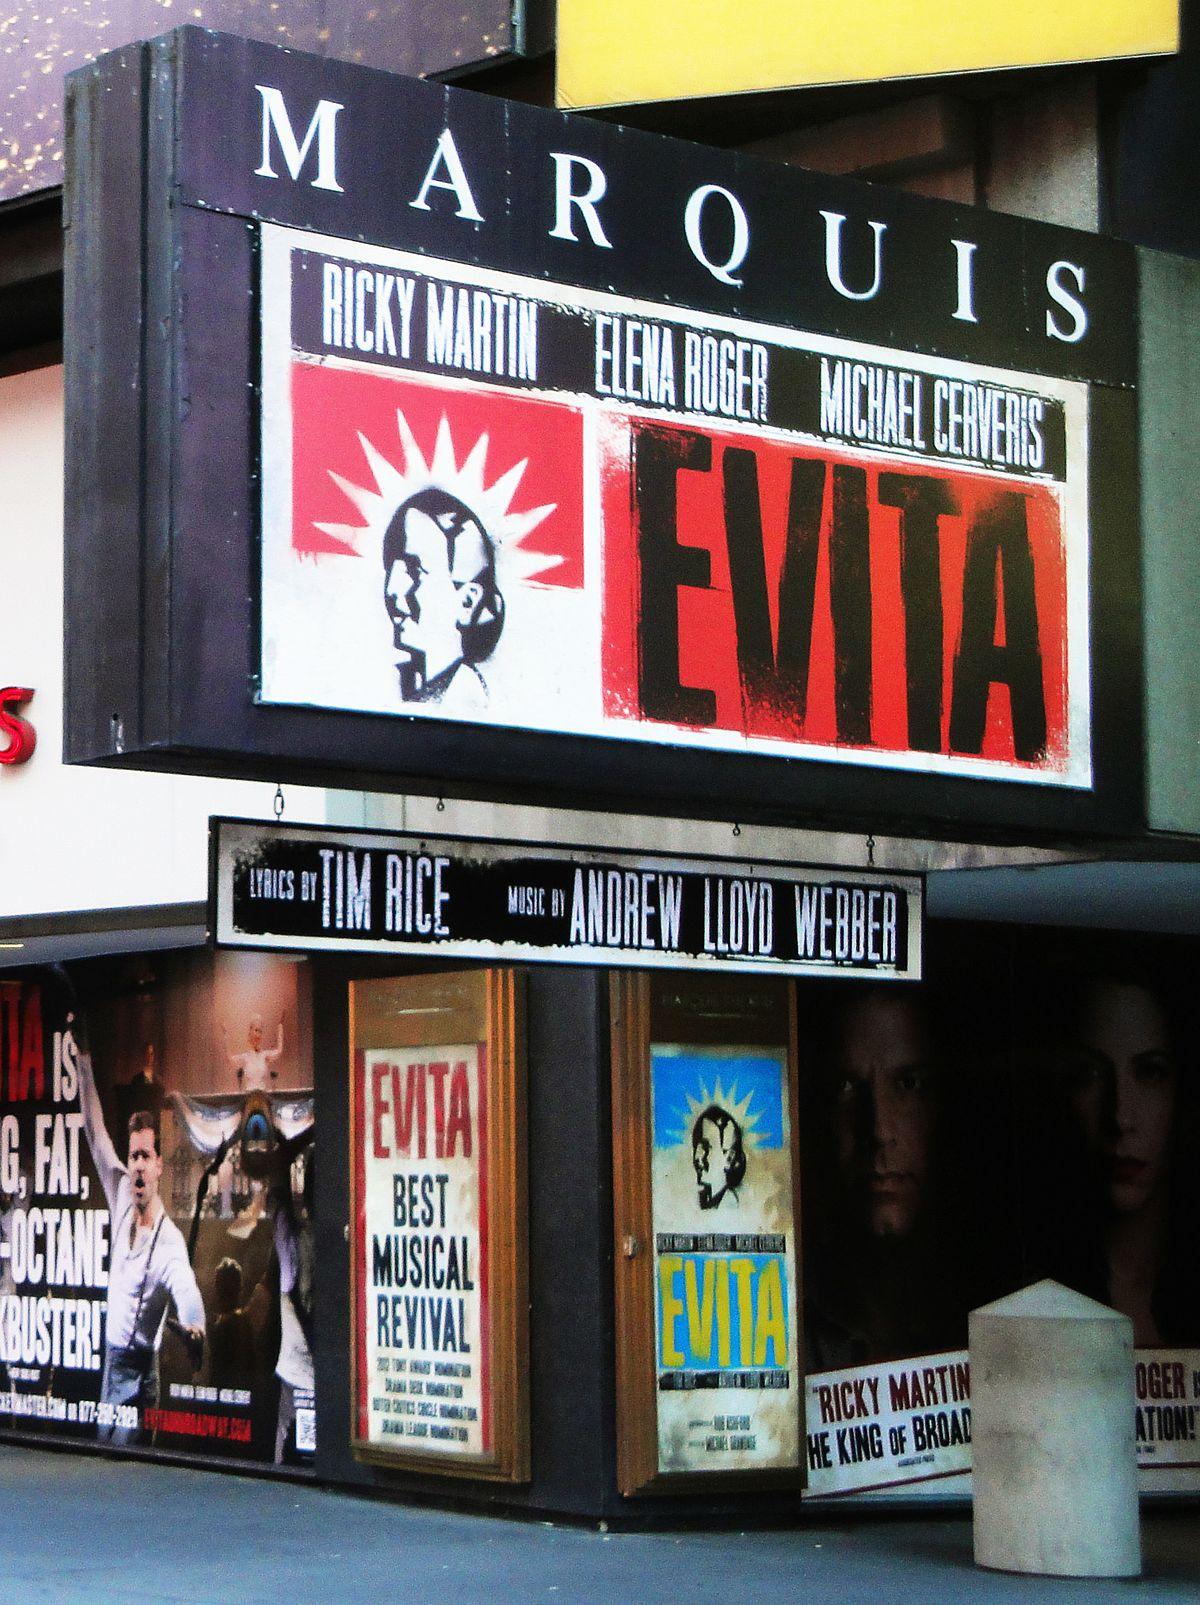 Evita (musical) - Wikipedia, la enciclopedia libre